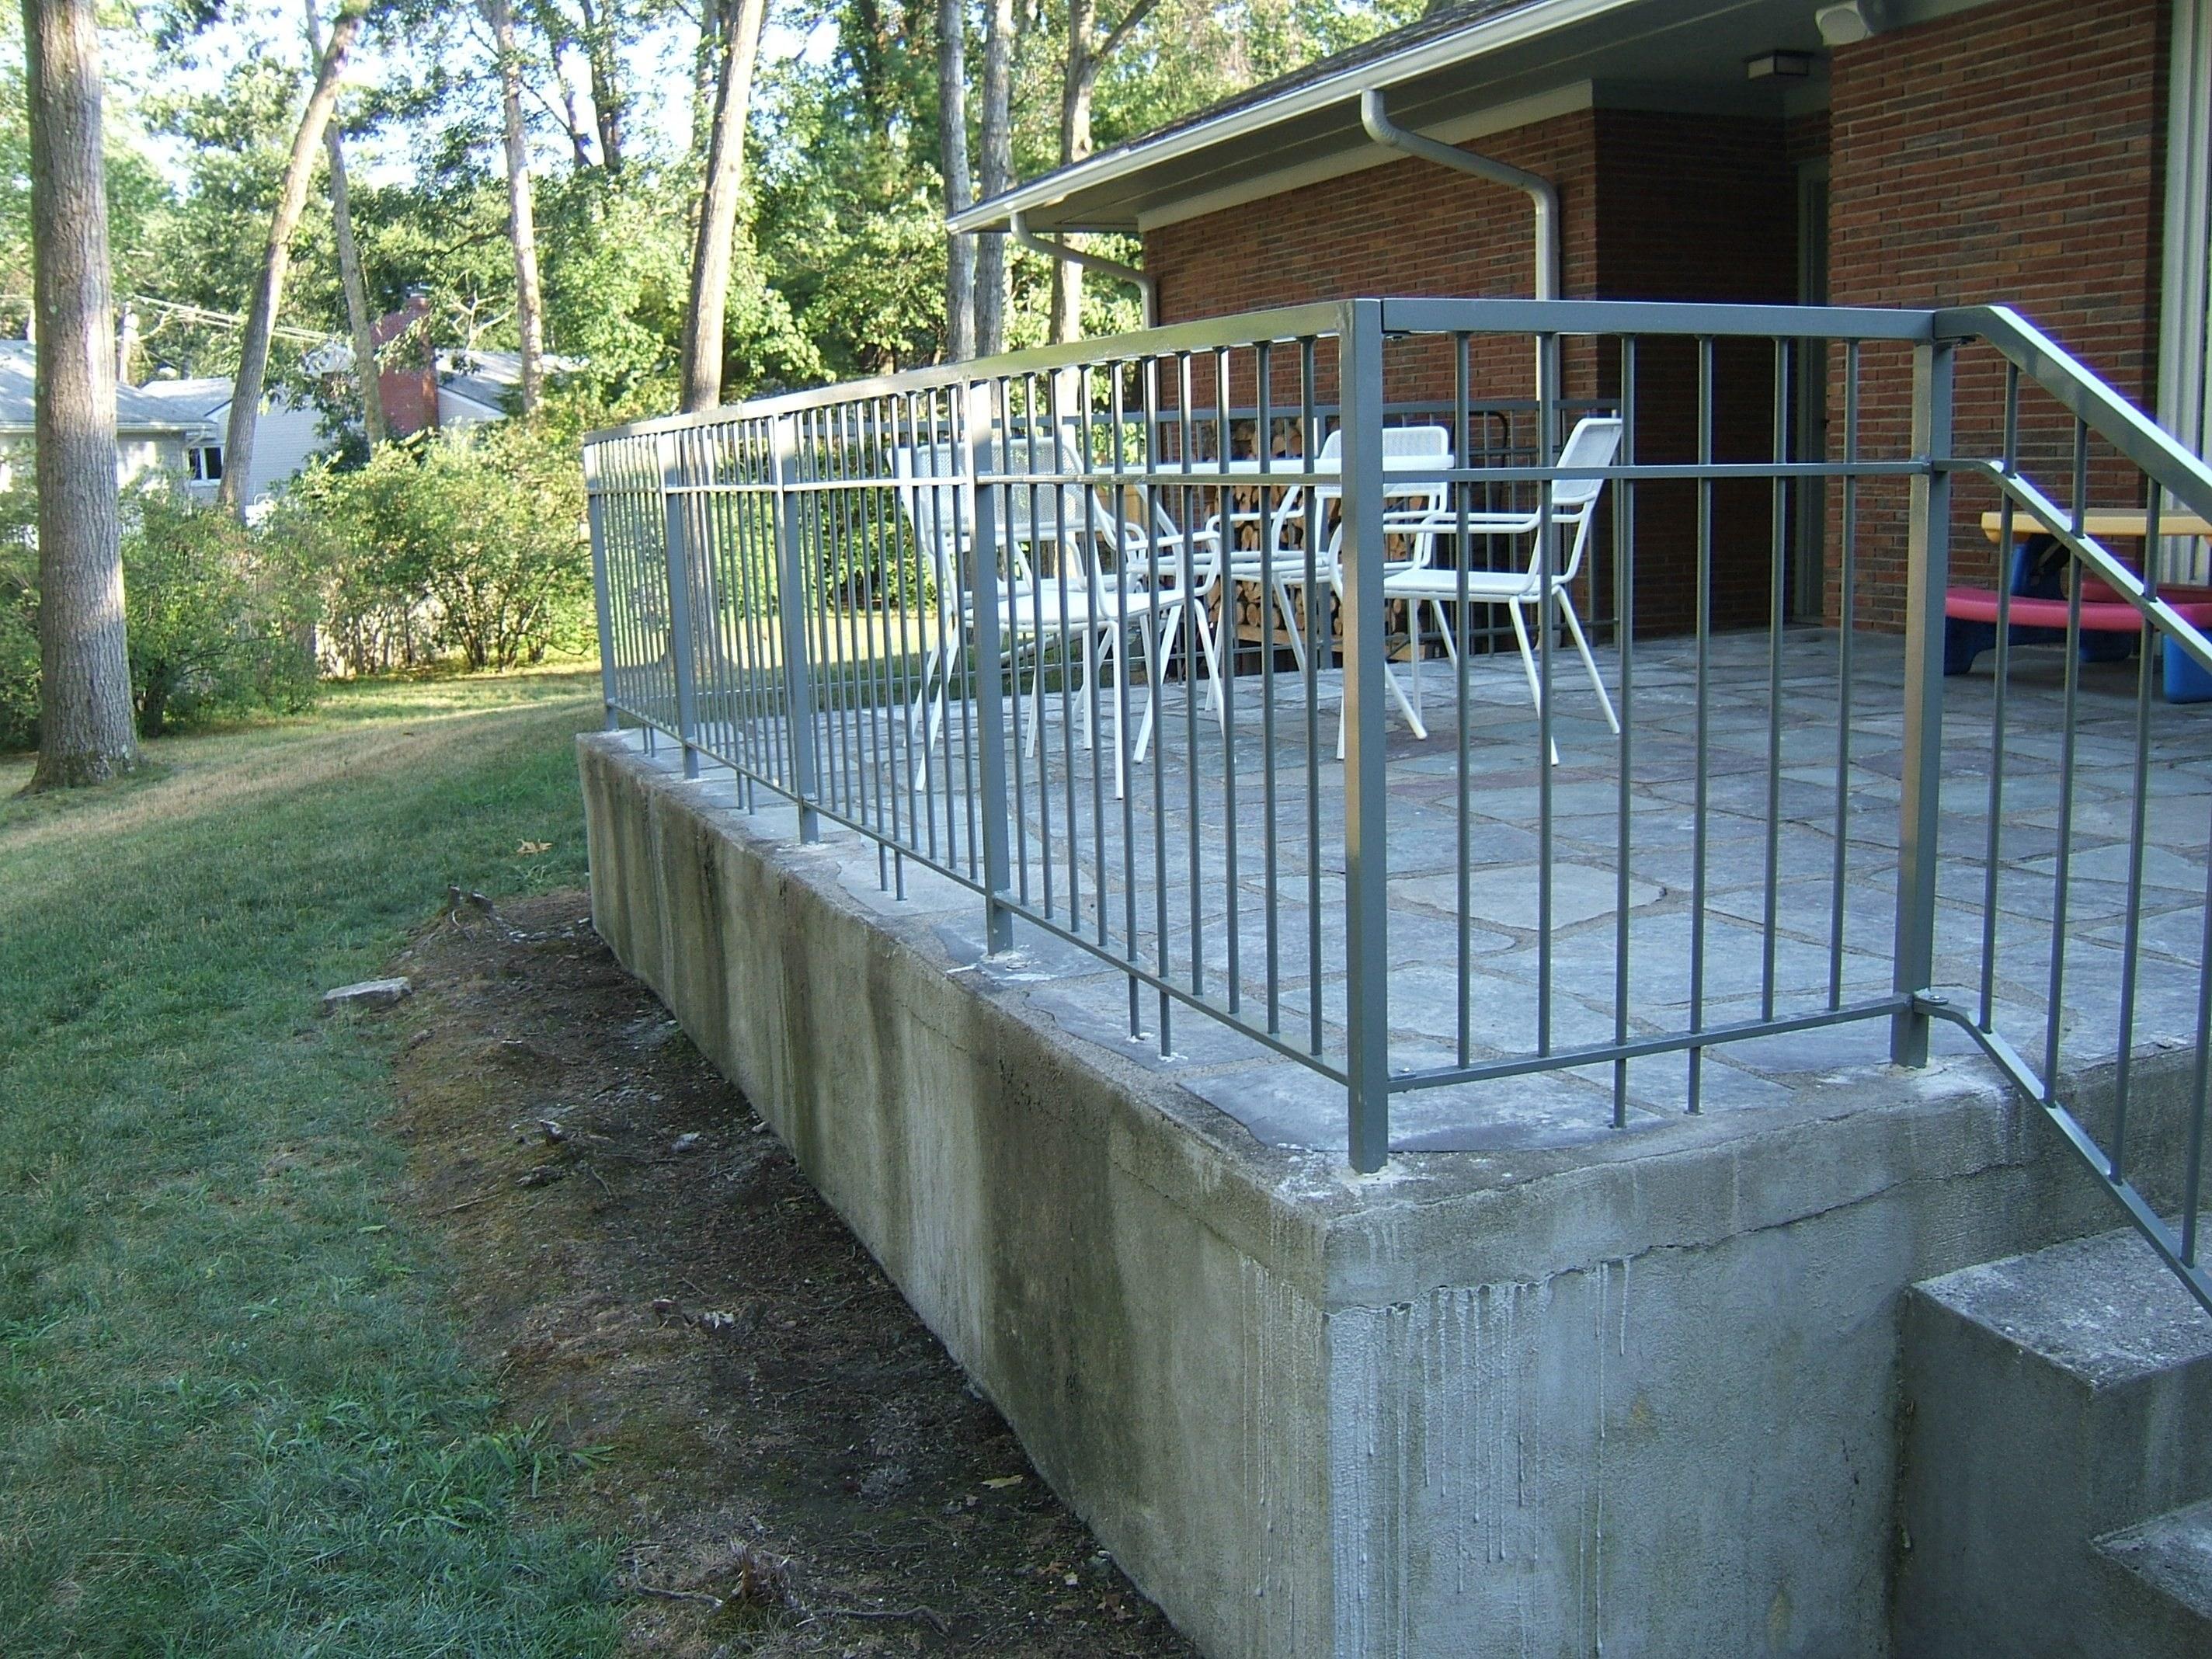 Custom Aluminum Railing Custom Metal Fences Custom Rail Tech | Railing For Concrete Porch | Residential | Paver Patio | Hand | Flagstone Porch | Repair